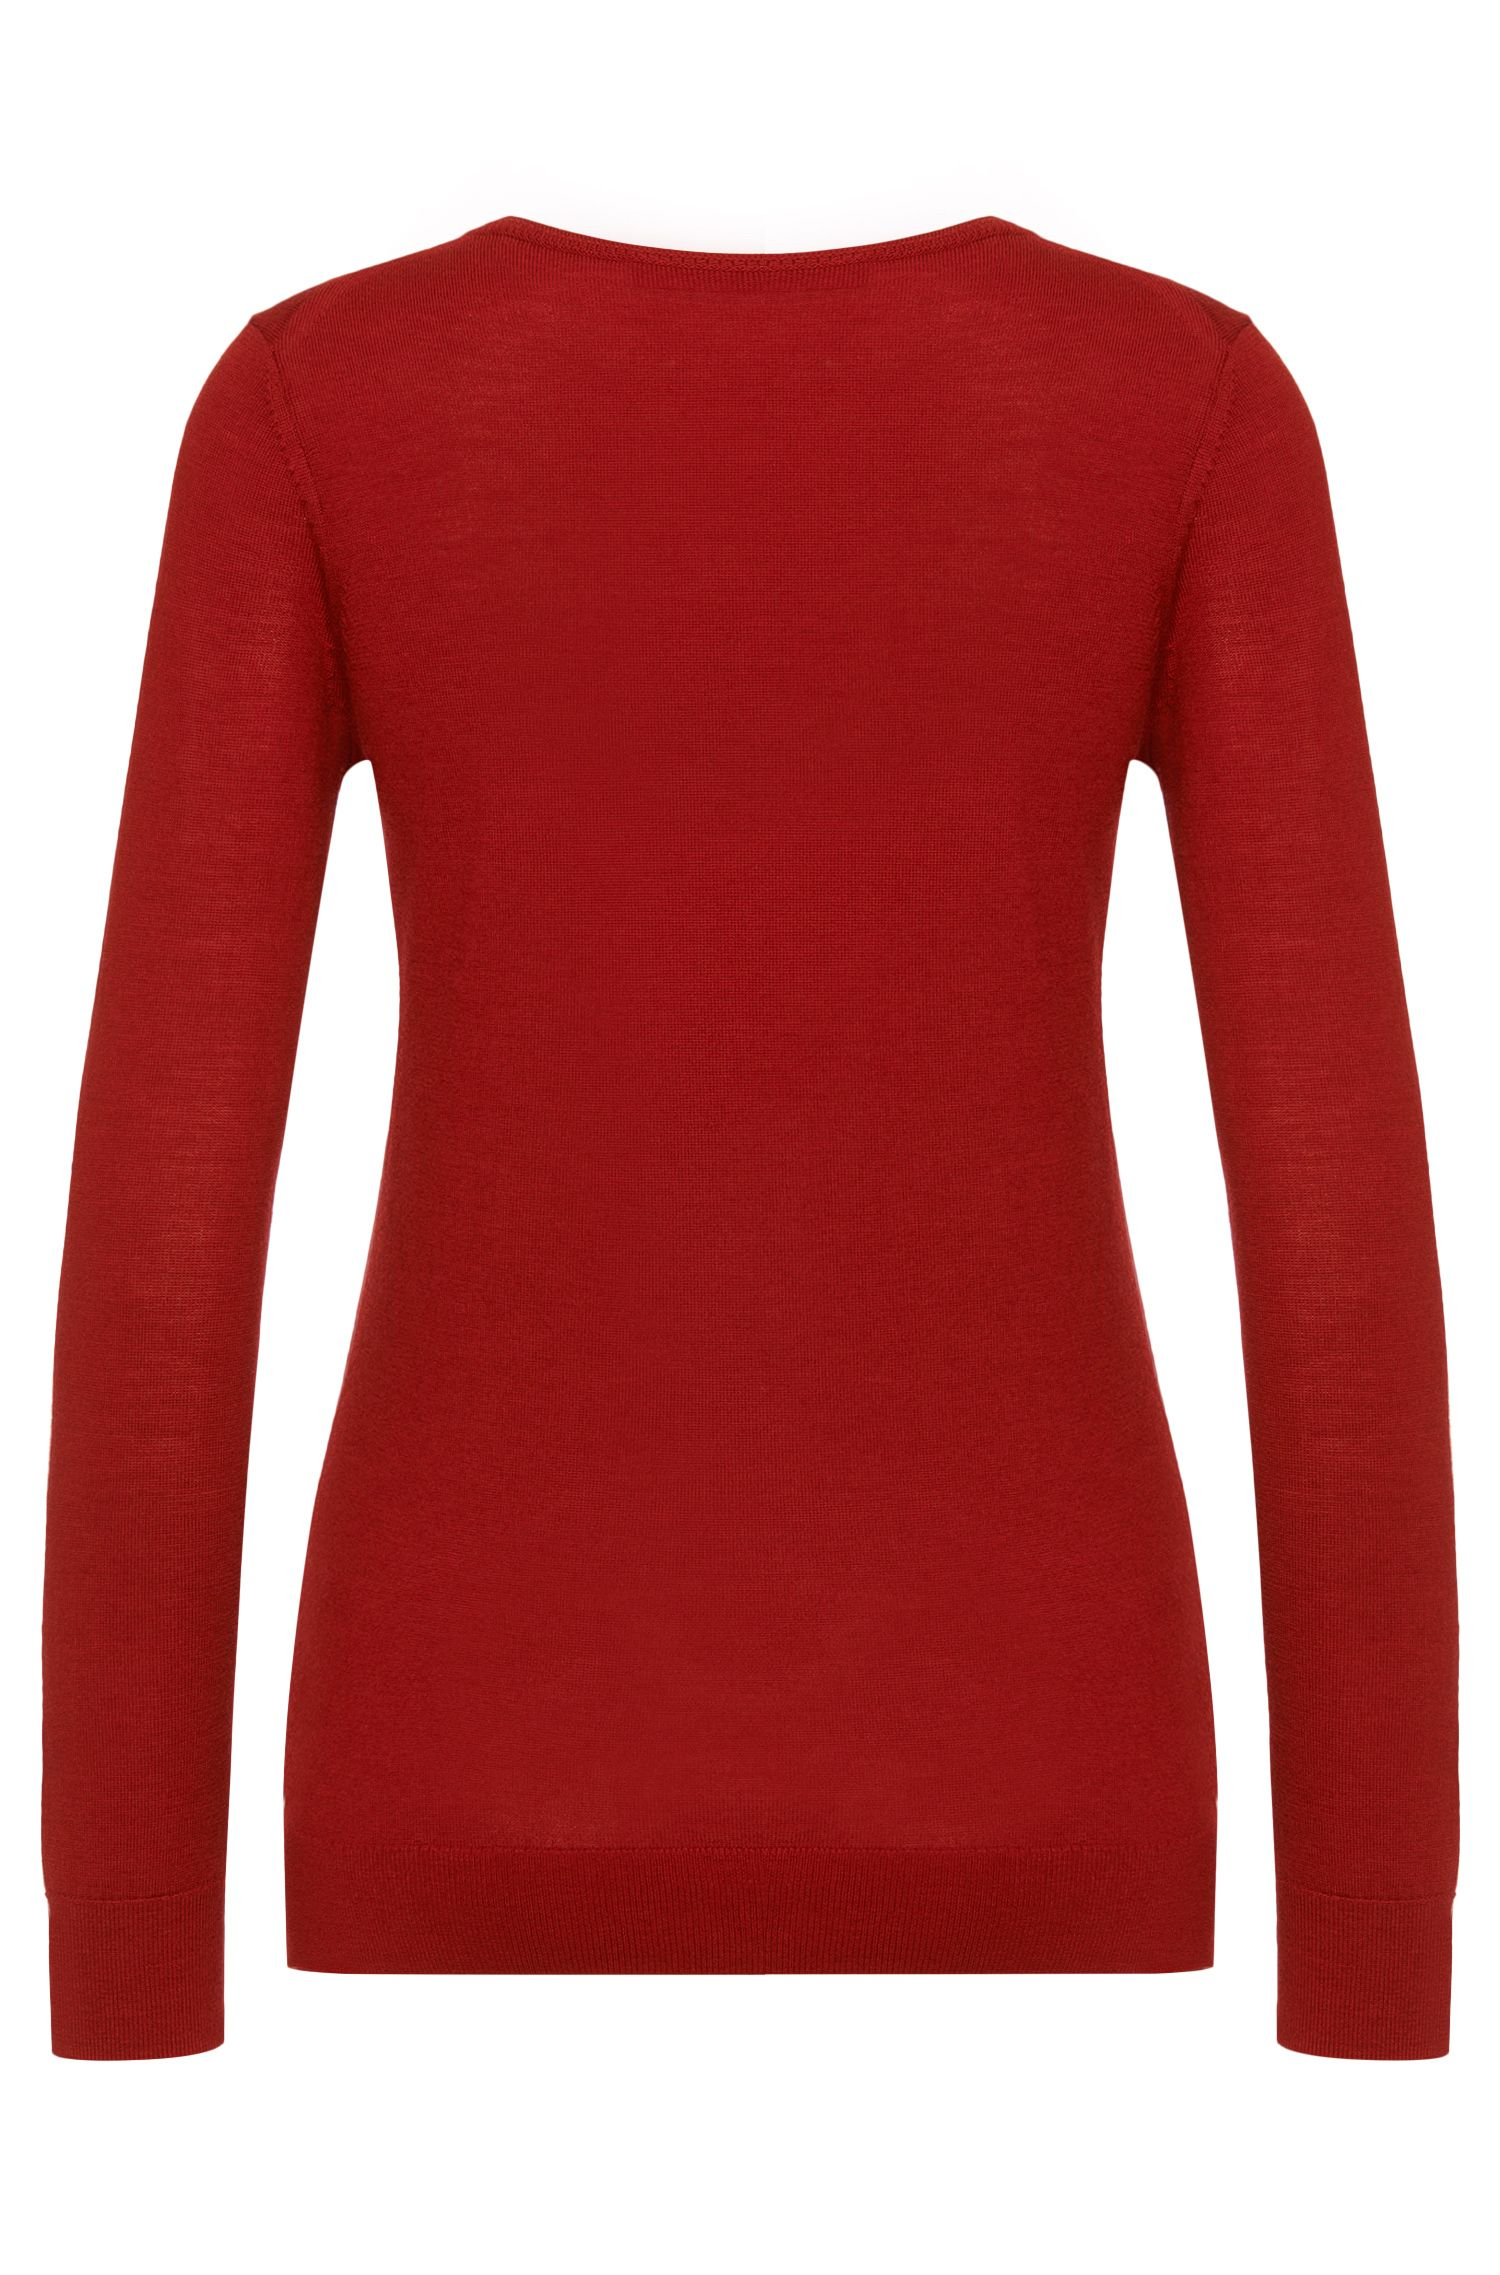 Unifarbener Pullover aus Schurwolle: 'Sedella'